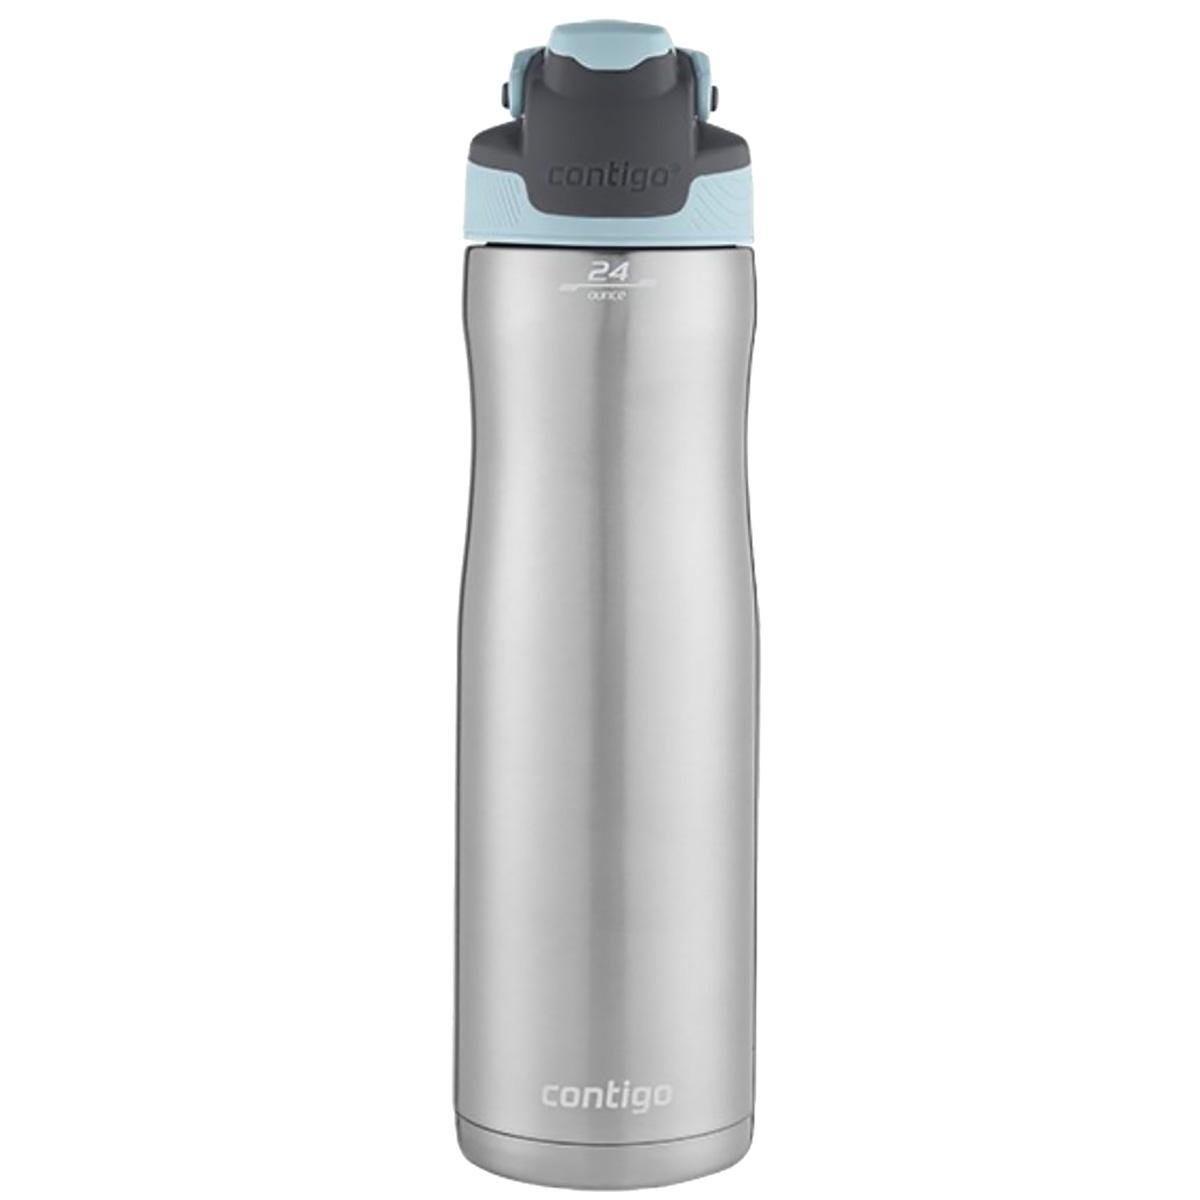 Contigo-24-oz-Chill-Autoseal-Stainless-Steel-Water-Bottle thumbnail 14